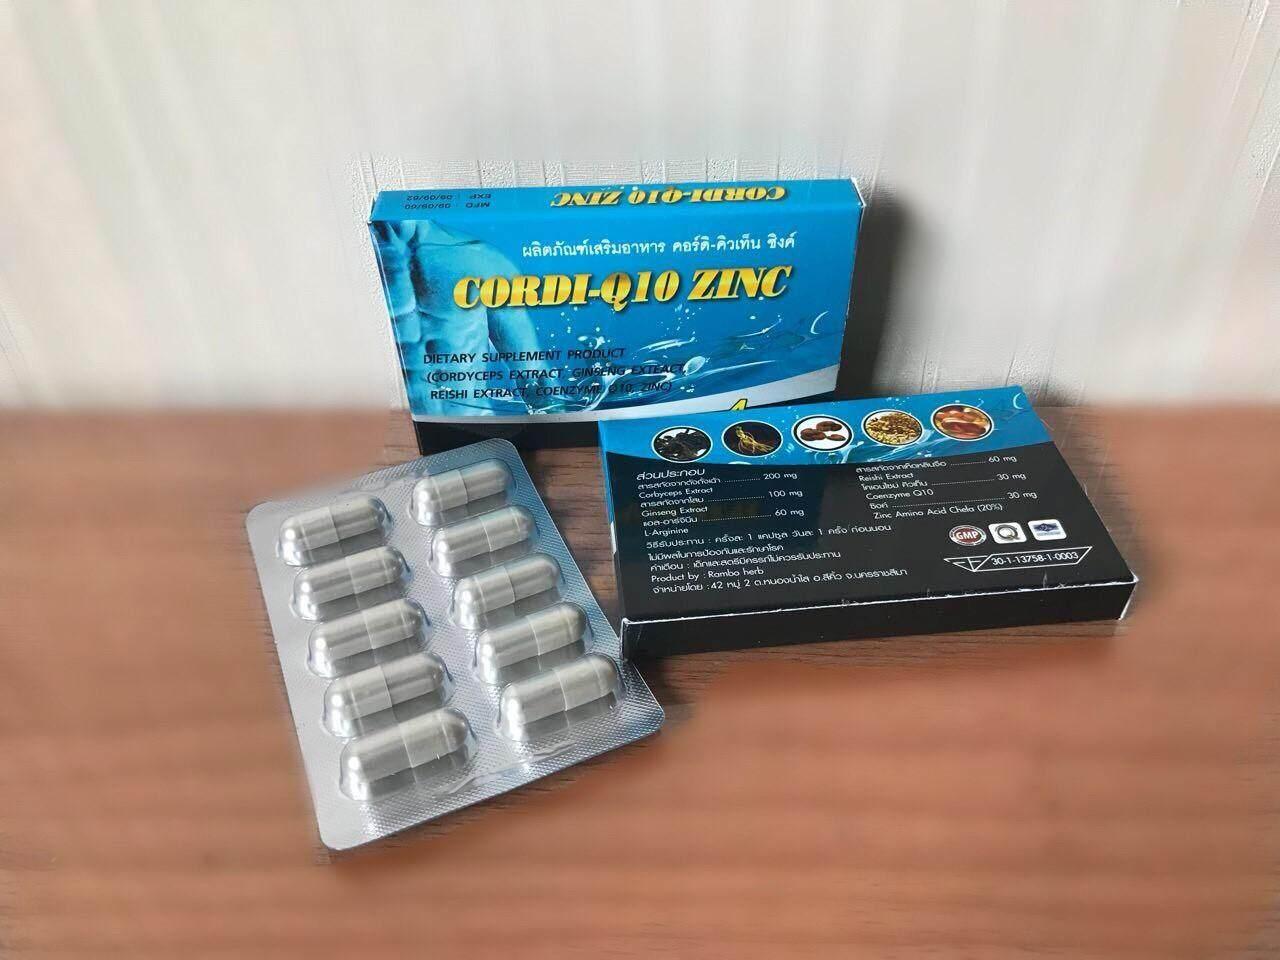 Cordi-Q10 Zinc, คอร์ดิ-คิวเทน ซิงค์, ยาอึด, ยาทน, ยามาราธอน, ยาสมุนไพรผู้ชาย, สมุนไพรธรรมชาติแบบกิน,อาหารเสริมผู้ชาย, ยาแก้หลั่งเร็ว.